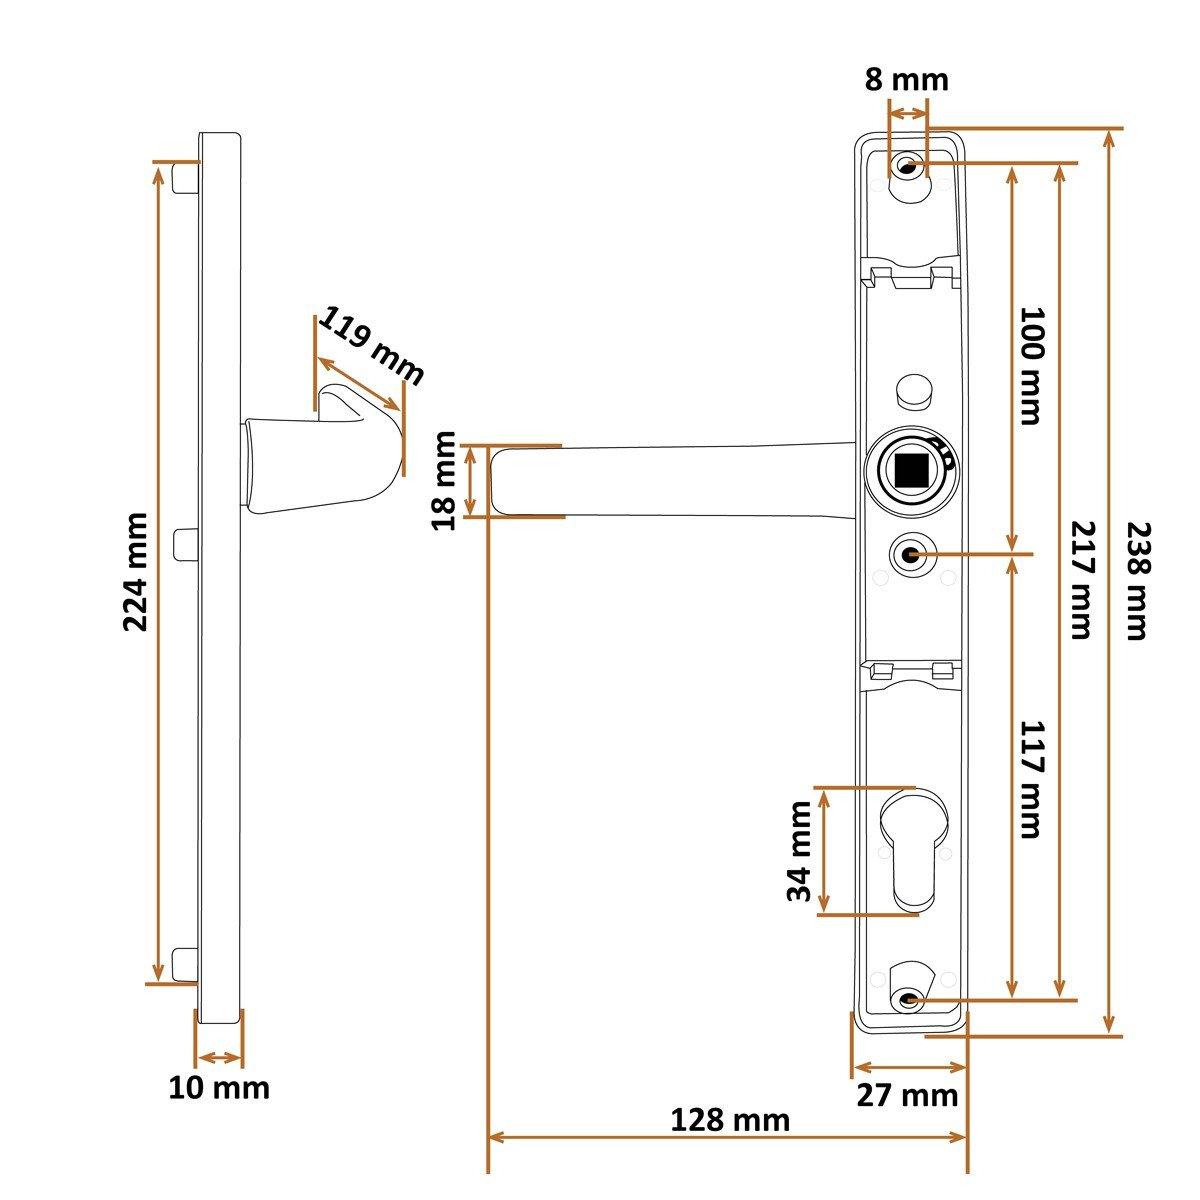 Creme RAL 9001 2x Griff Türgriff Türdrücker Türklinke Drückergarnitur DHS 92mm